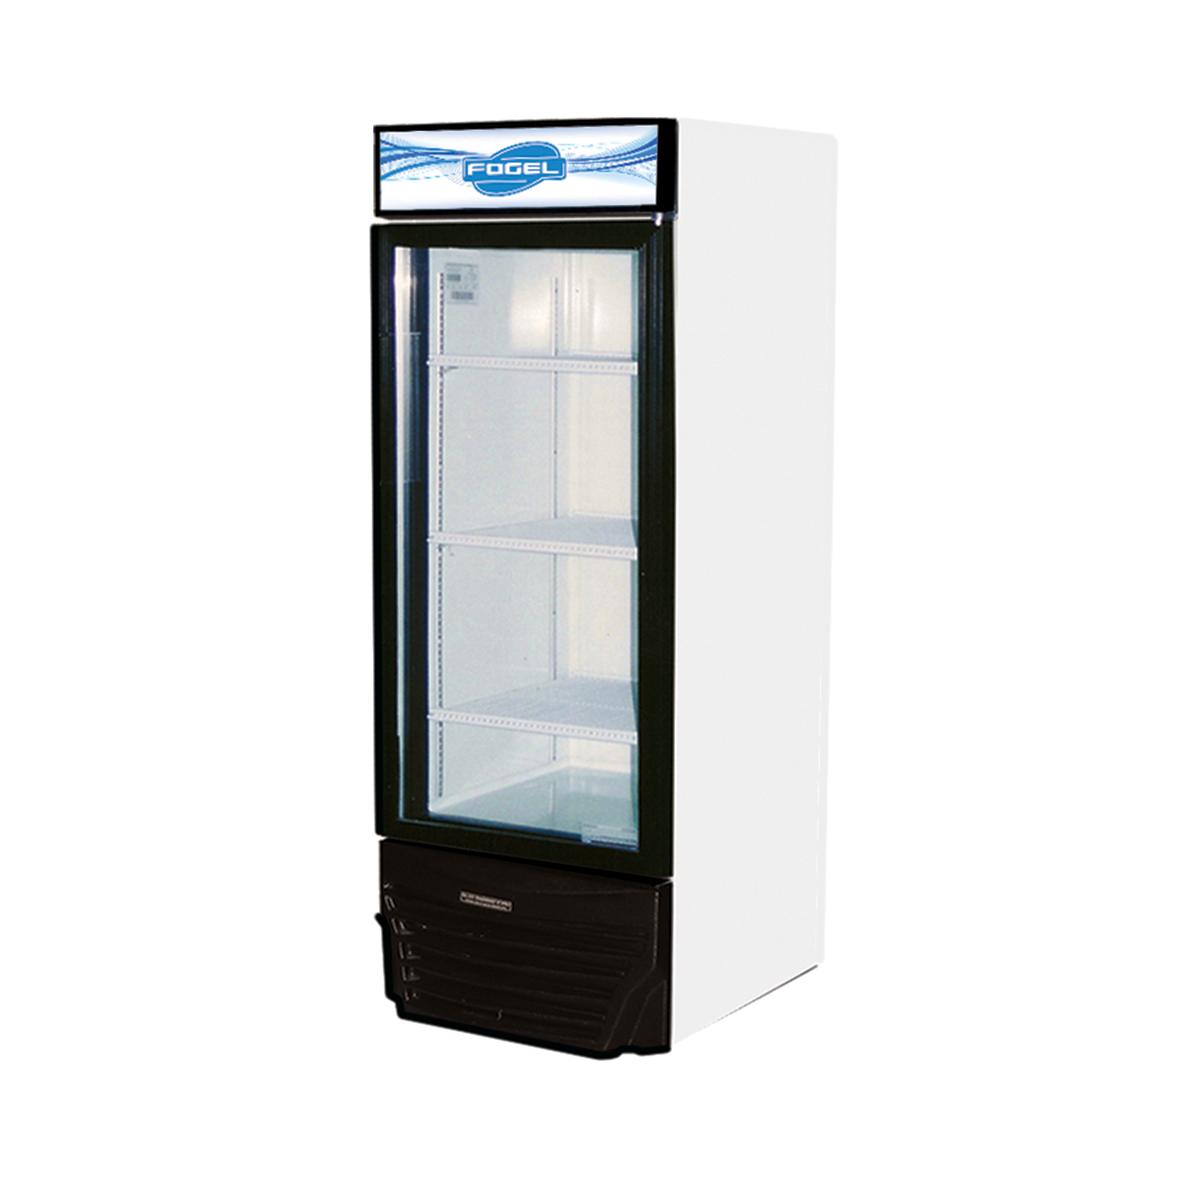 Fogel USA VR-8-HC refrigerator, merchandiser